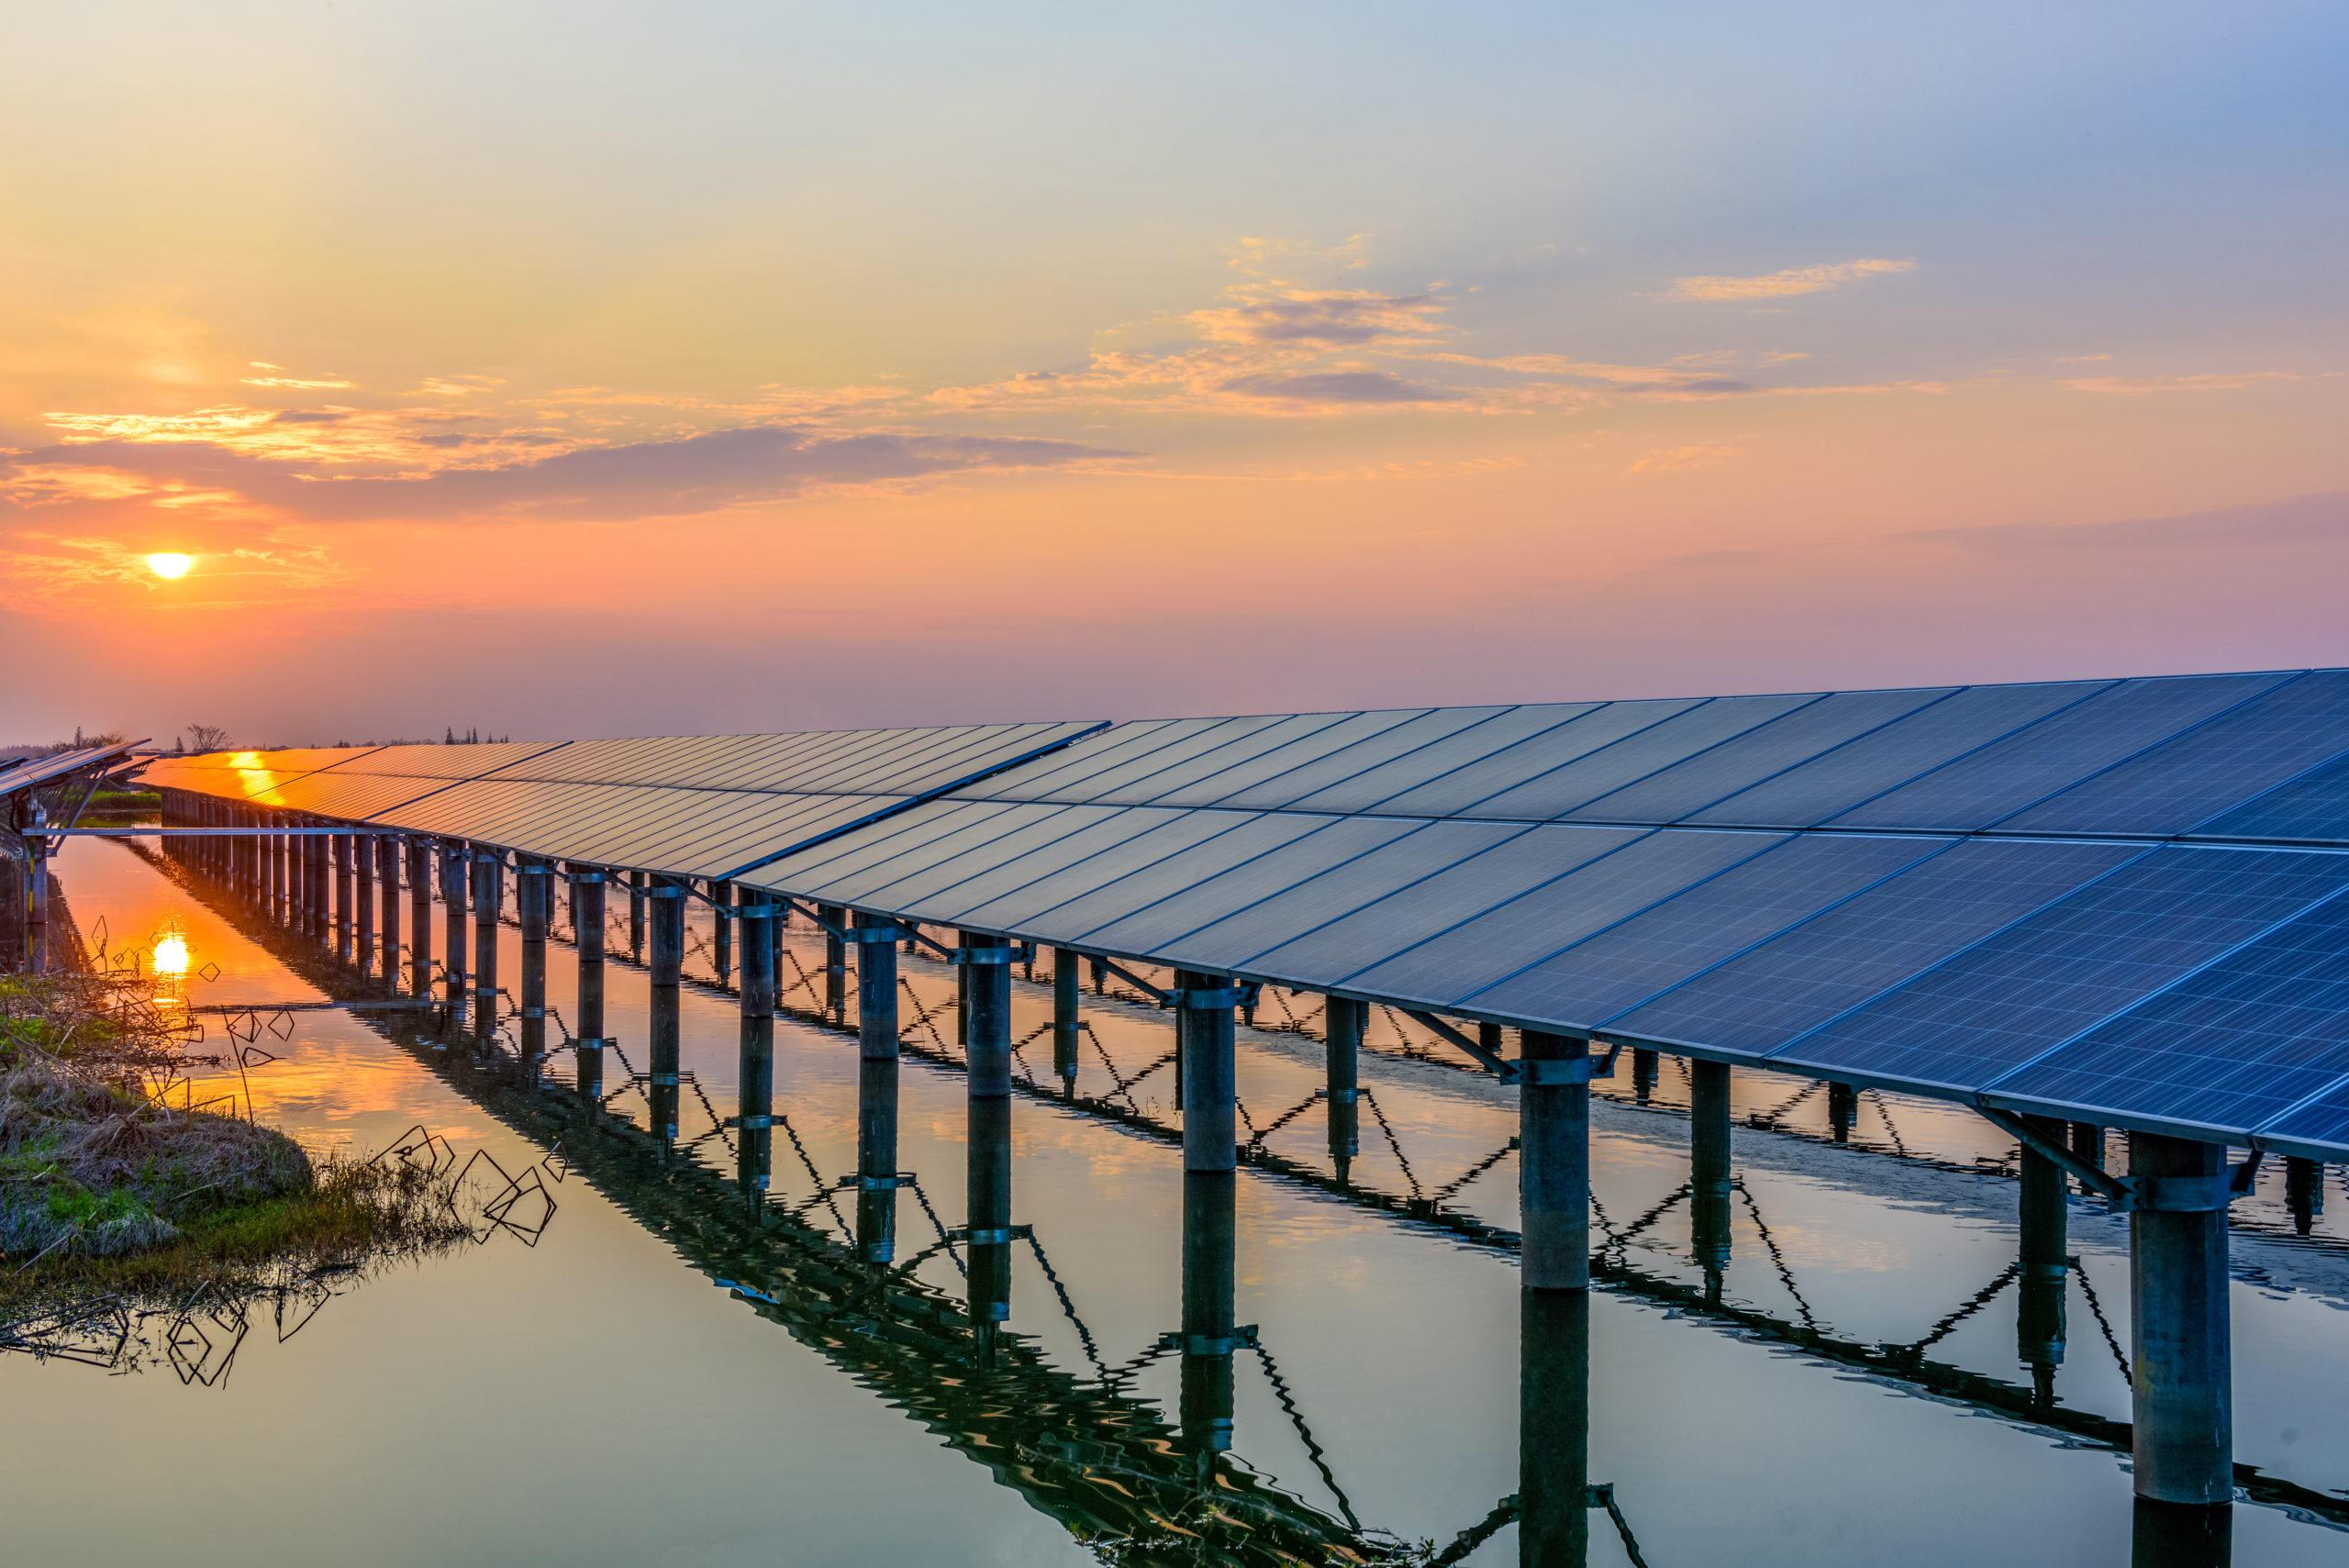 solar panel grid, sunset, sun energy